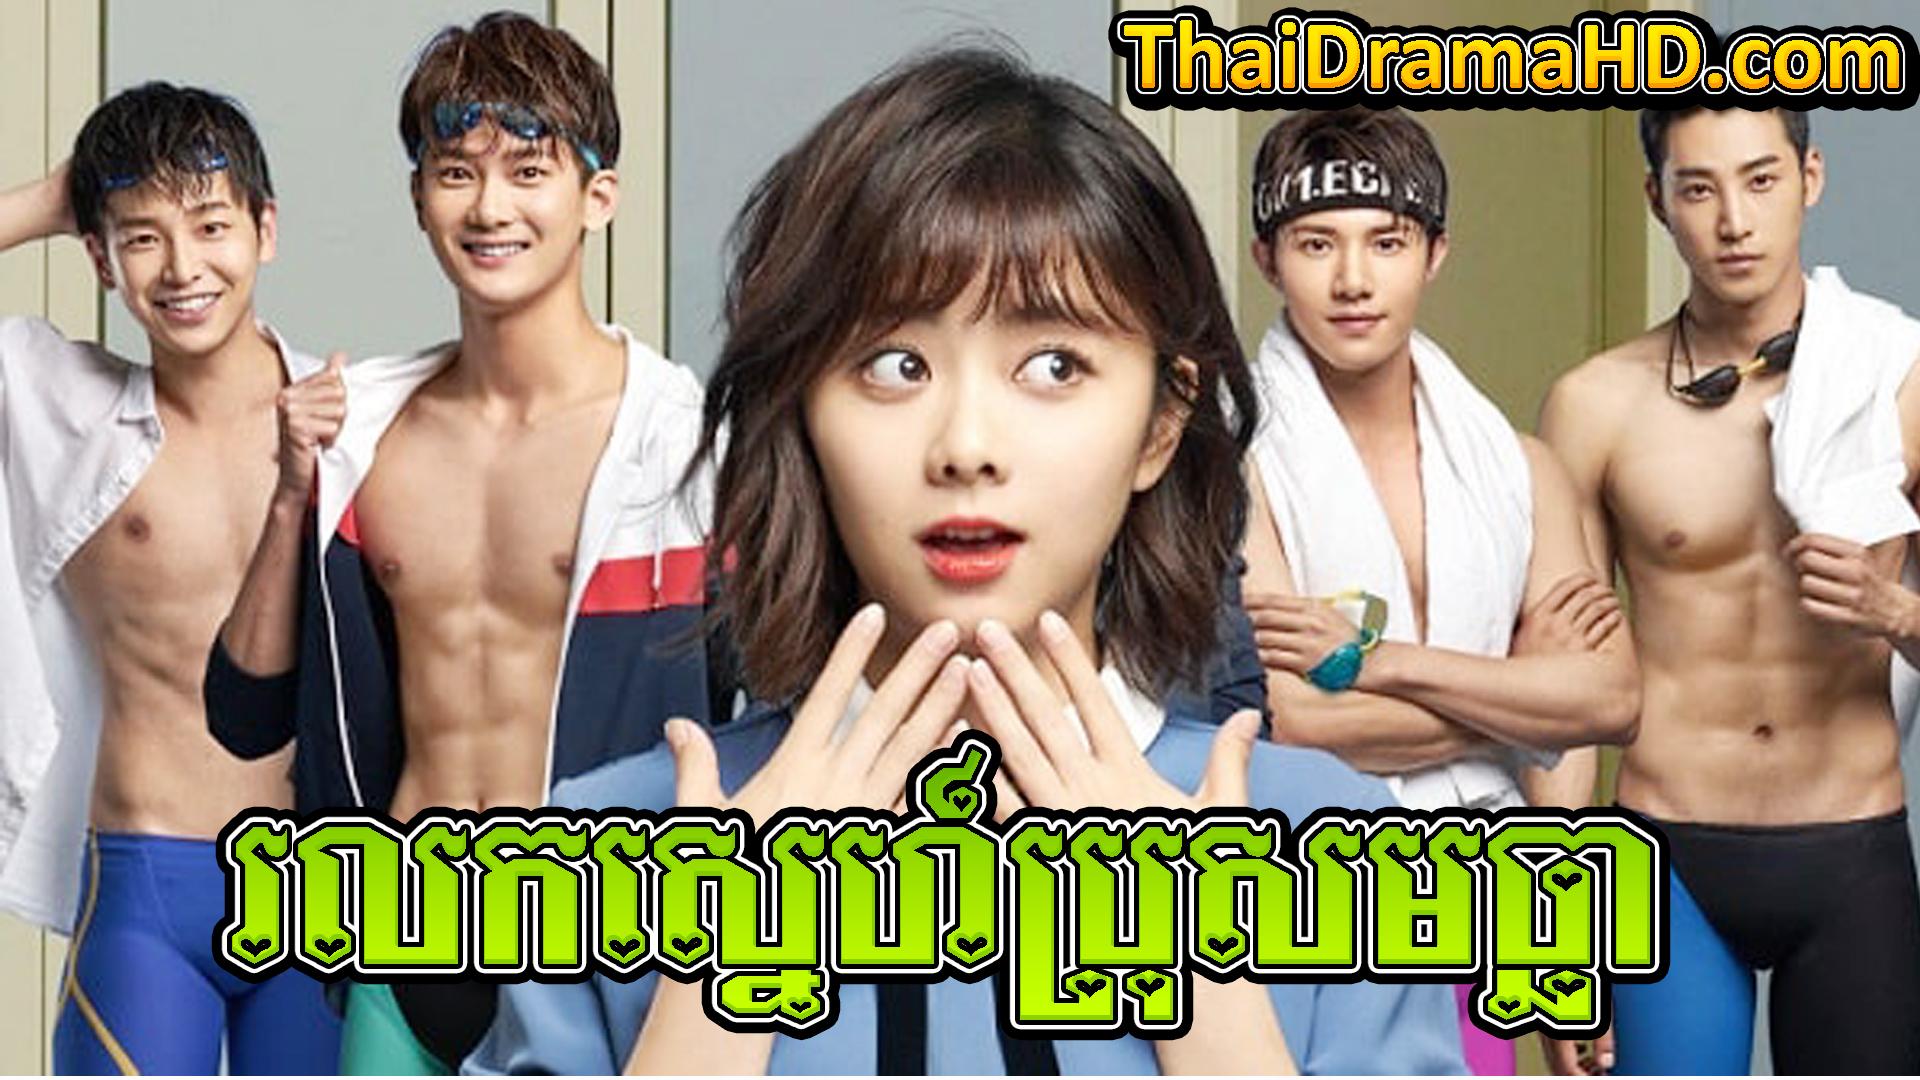 Rolok Sne Pros Machha | Thai Drama | Khmer Movie | Phumikhmer | movie-khmer | video4khmer | khmotions | kolabkhmer | khmer drama | ksdrama | cookingtips | roscheat | khmertimeskh | khmerkomsan | phumi7 | merlkon | film2us | movie2kh | sweetdrama | khmercitylove | khreplay | tvb cambodia drama | ckh7 | srokthai | phumimedia | phumi8 | khmer avenue | khmer search | Soyo | khmerfans